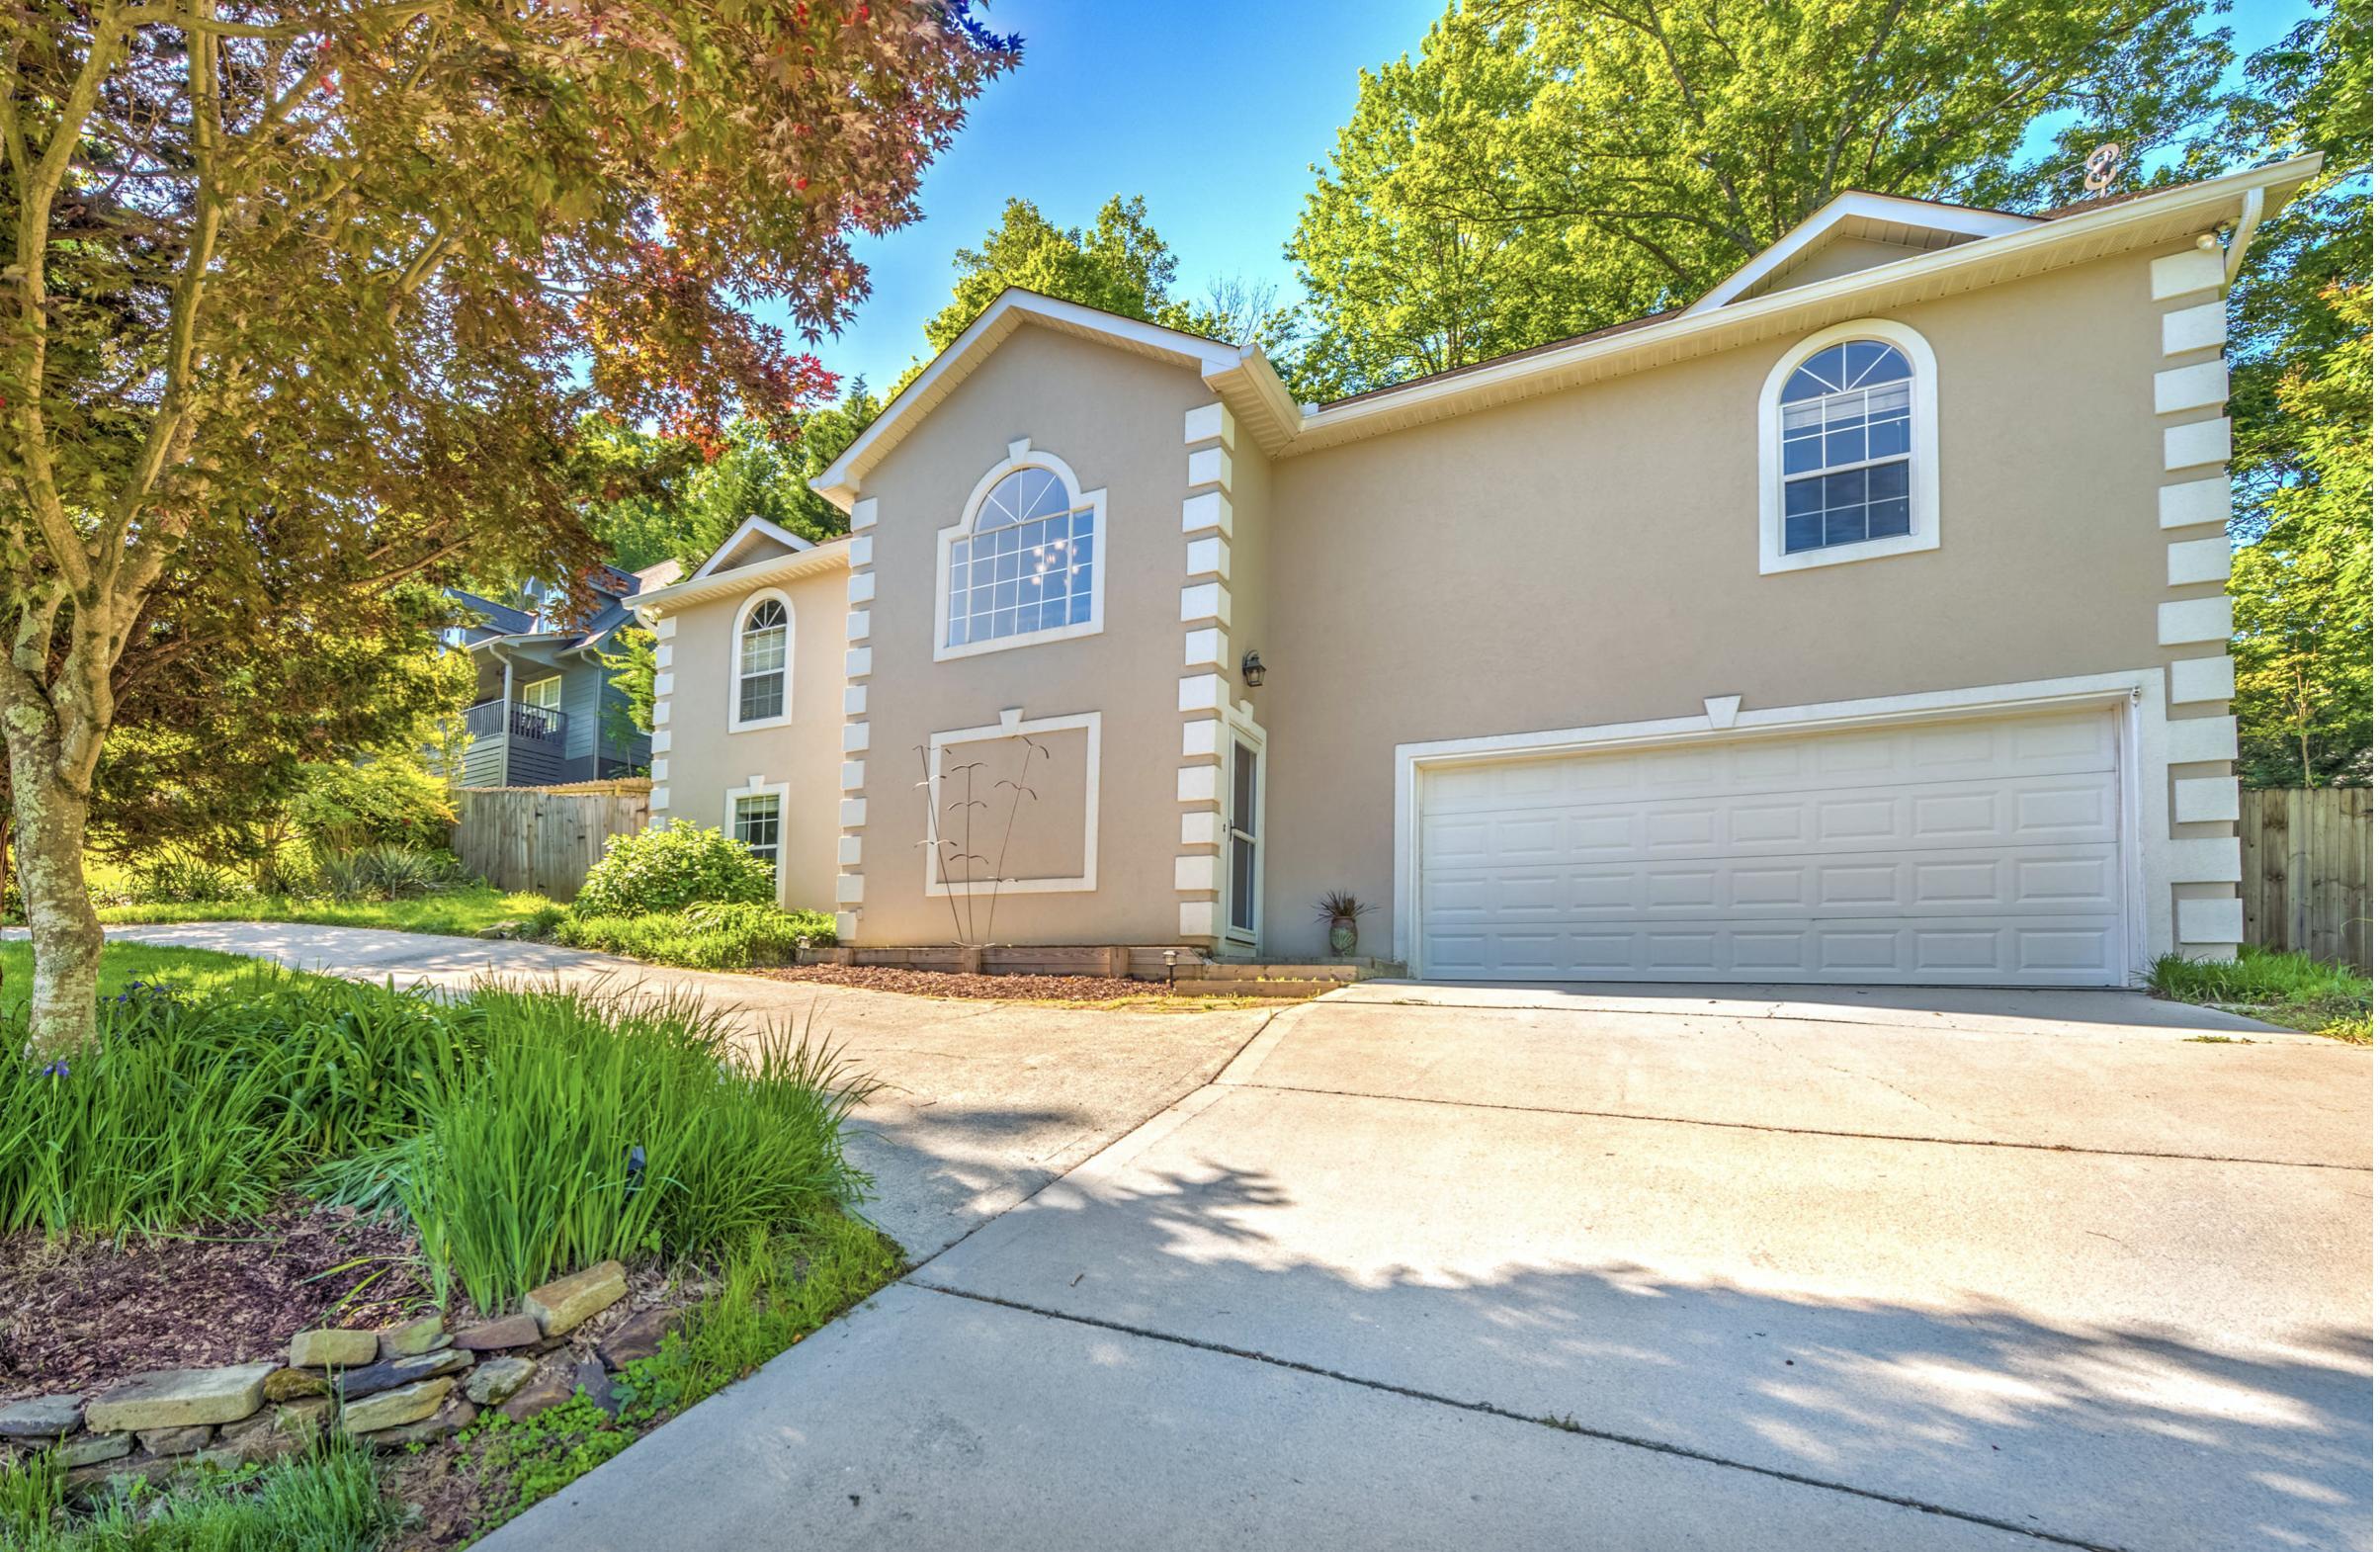 9932 Sierra Vista, Knoxville, Tennessee, United States 37922, 3 Bedrooms Bedrooms, ,3 BathroomsBathrooms,Single Family,For Sale,Sierra Vista,1125253